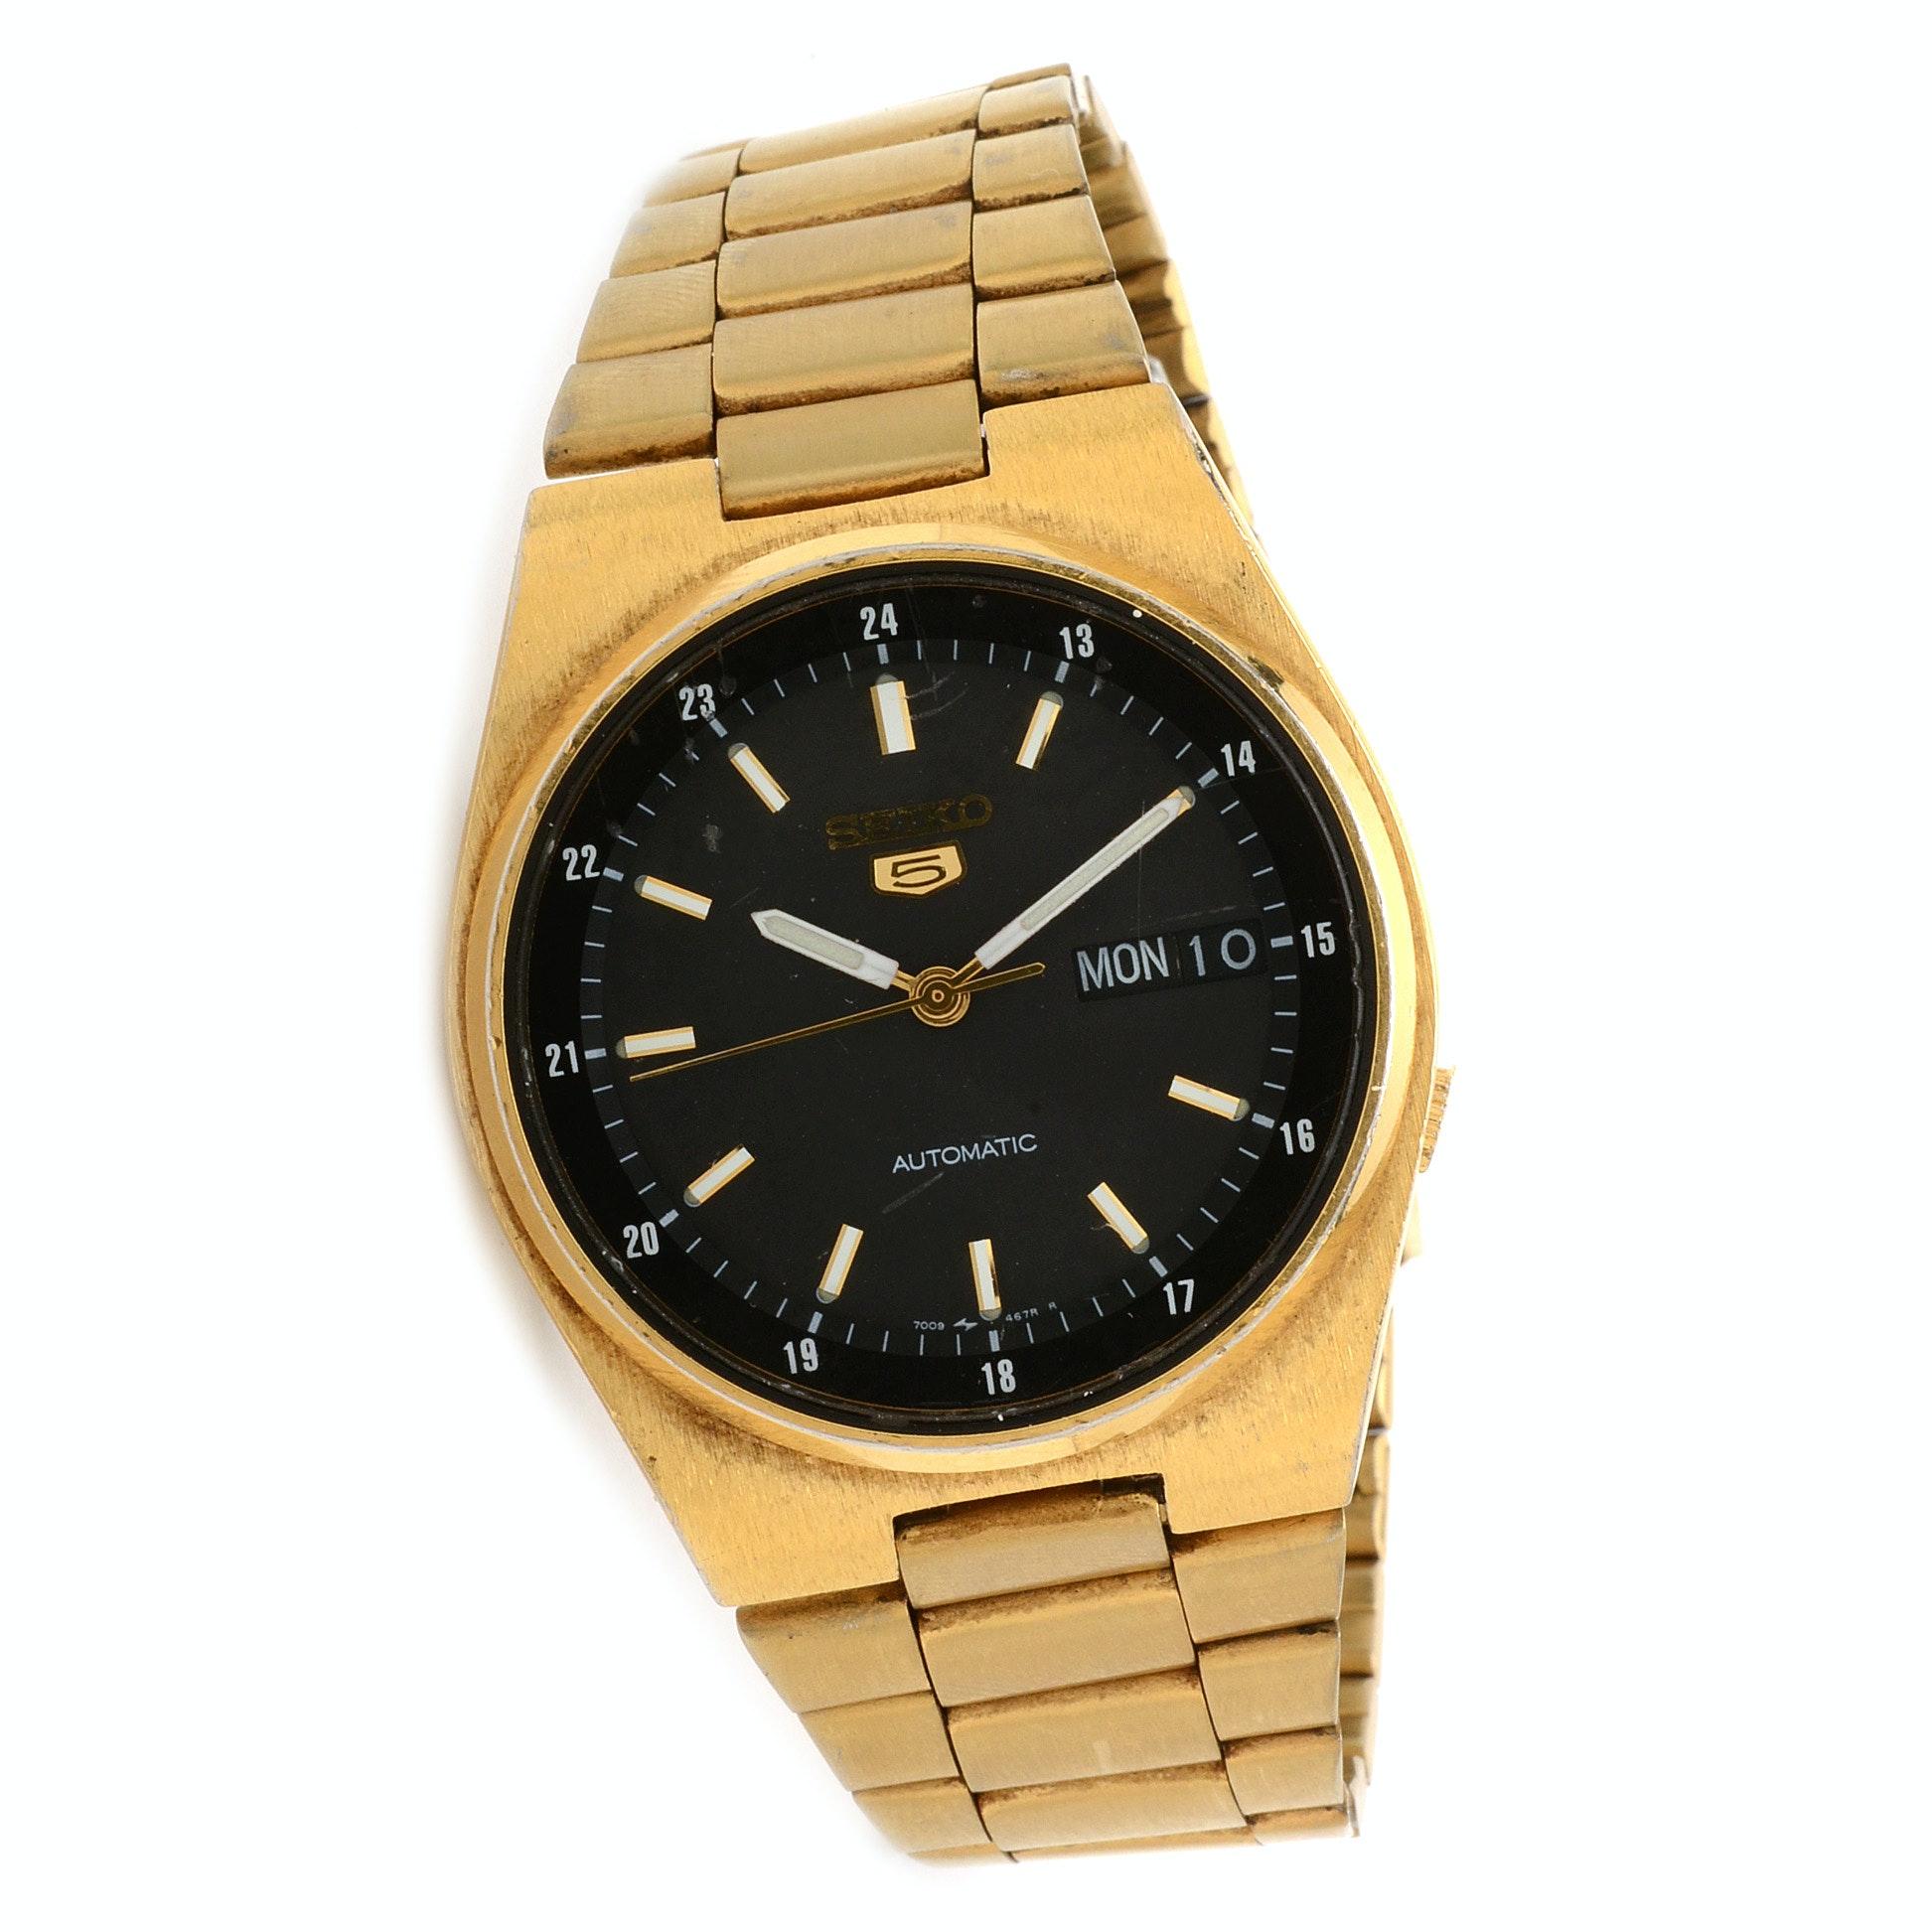 Seiko Automatic Gold-Tone Wristwatch